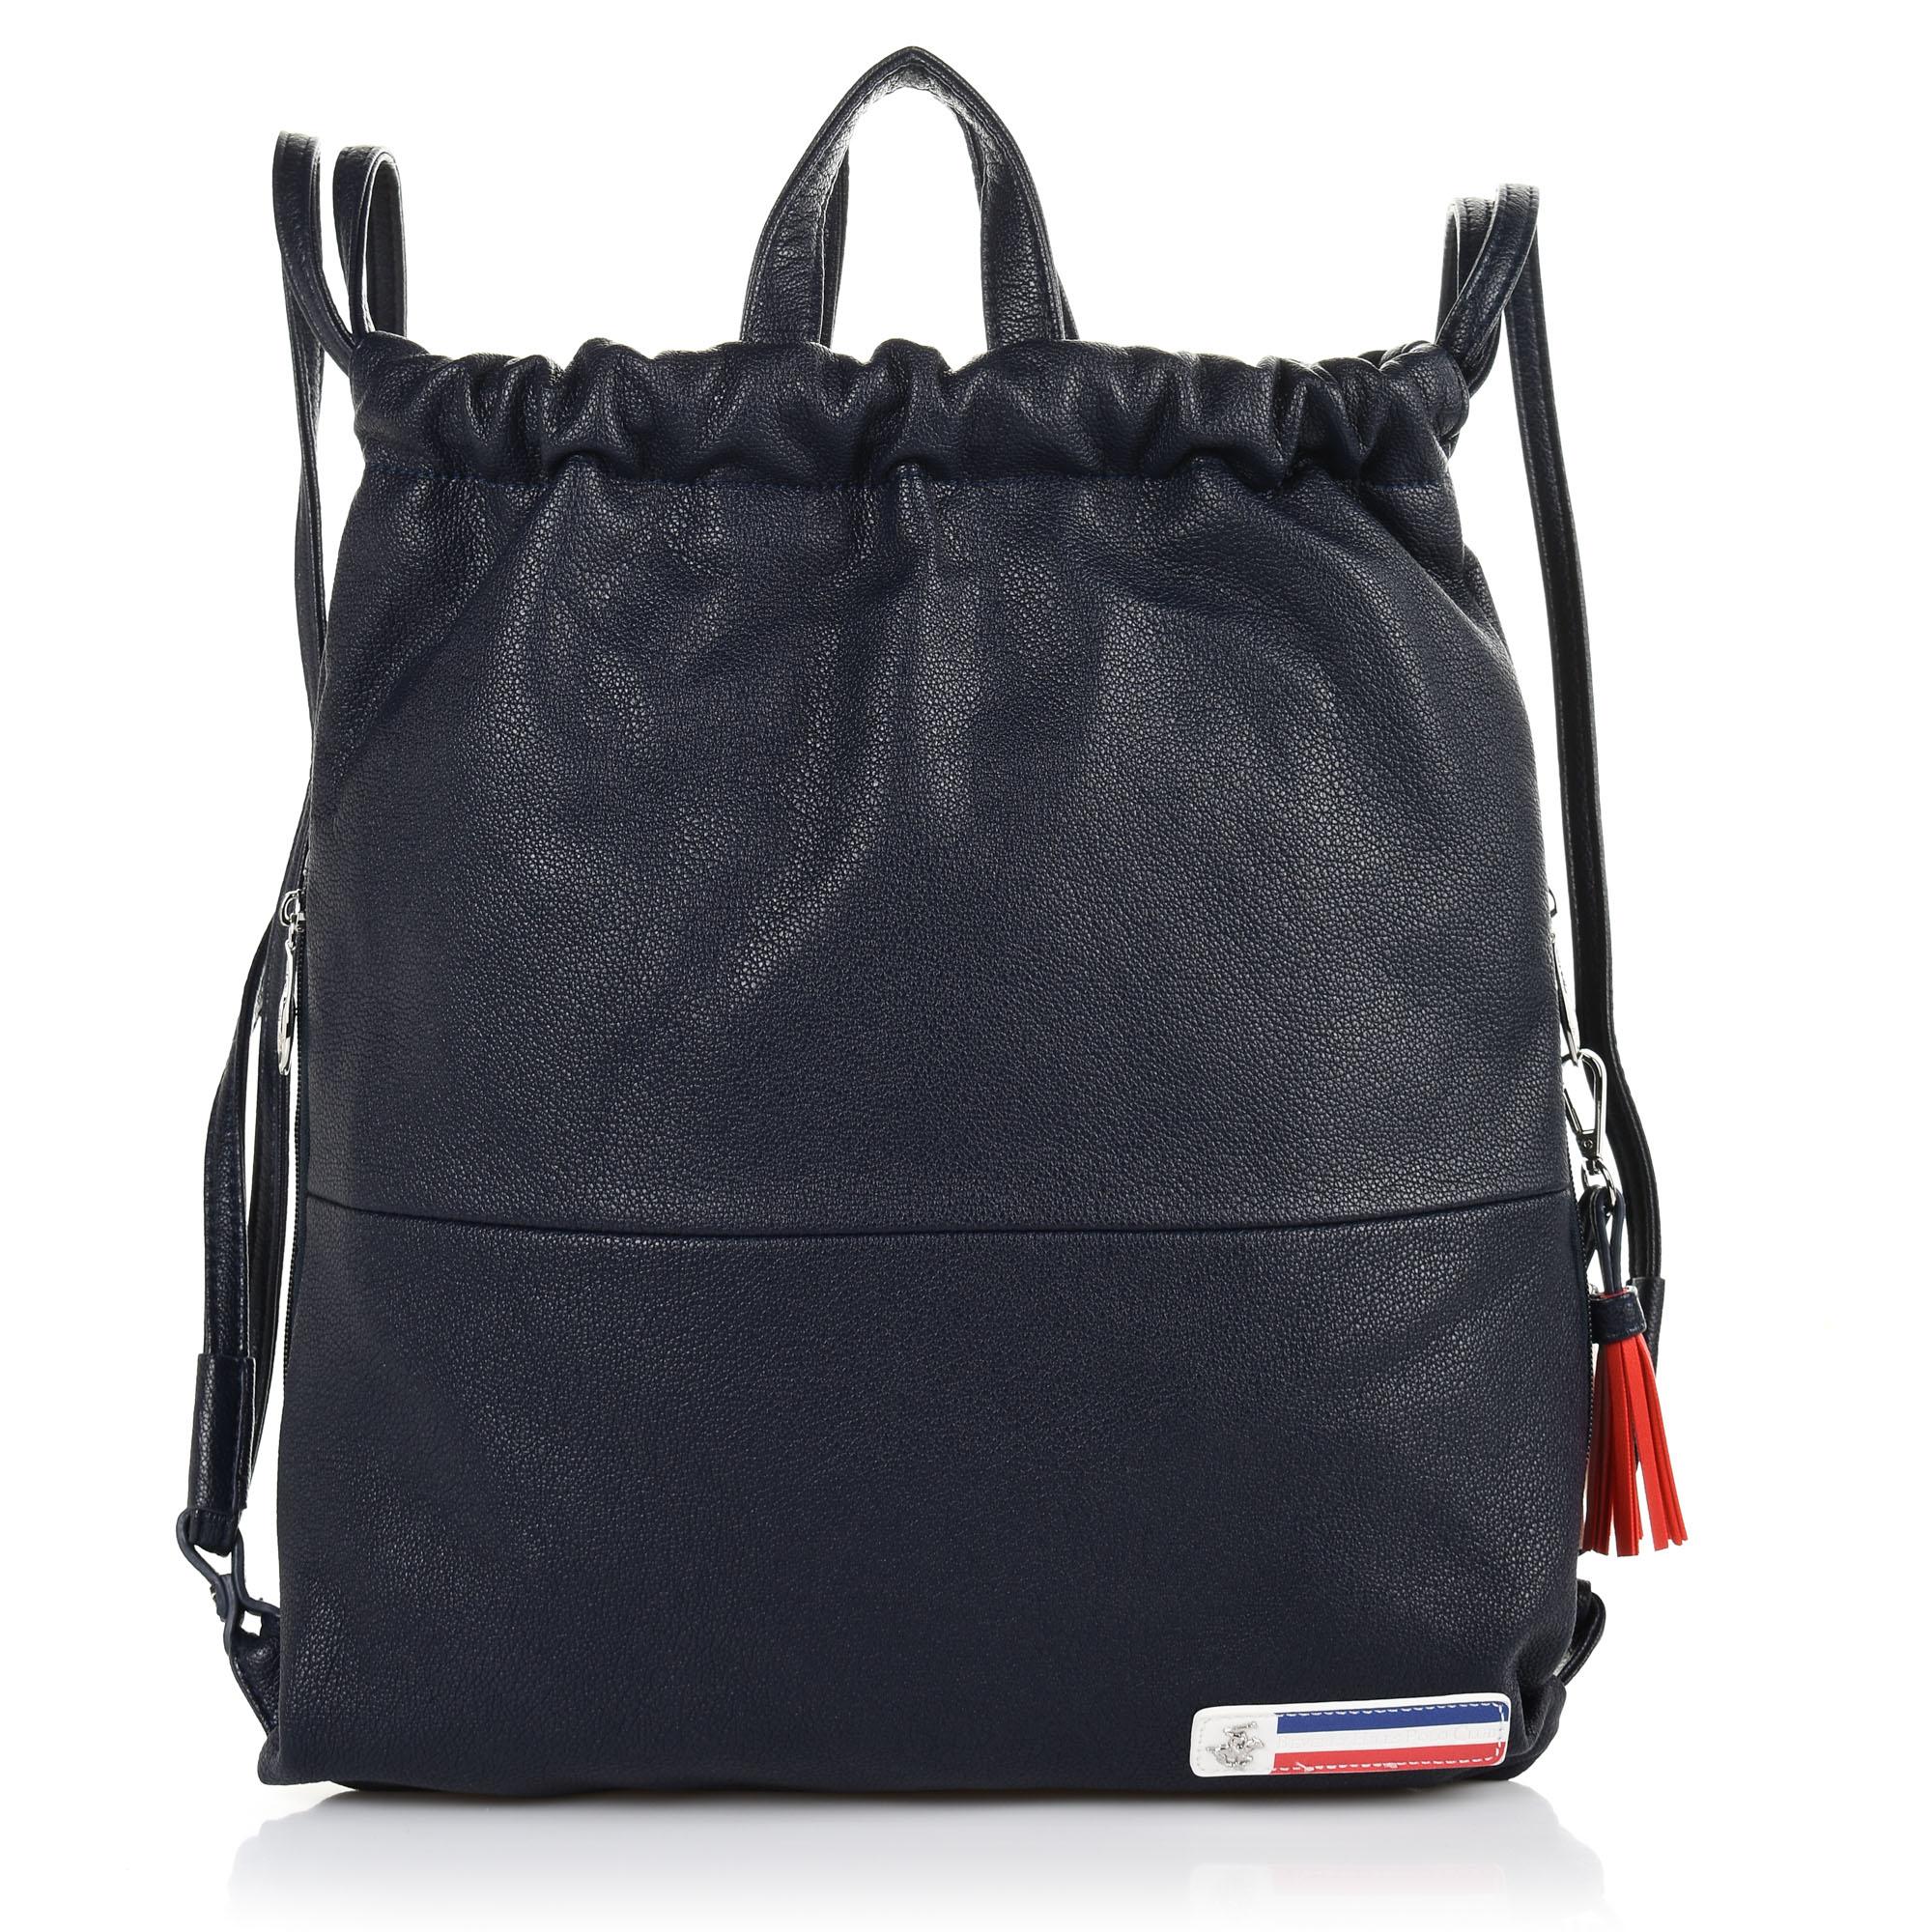 3e1331302a Brand Bags Σακίδιο Πλάτης Beverly Hills Polo Club BH-1723